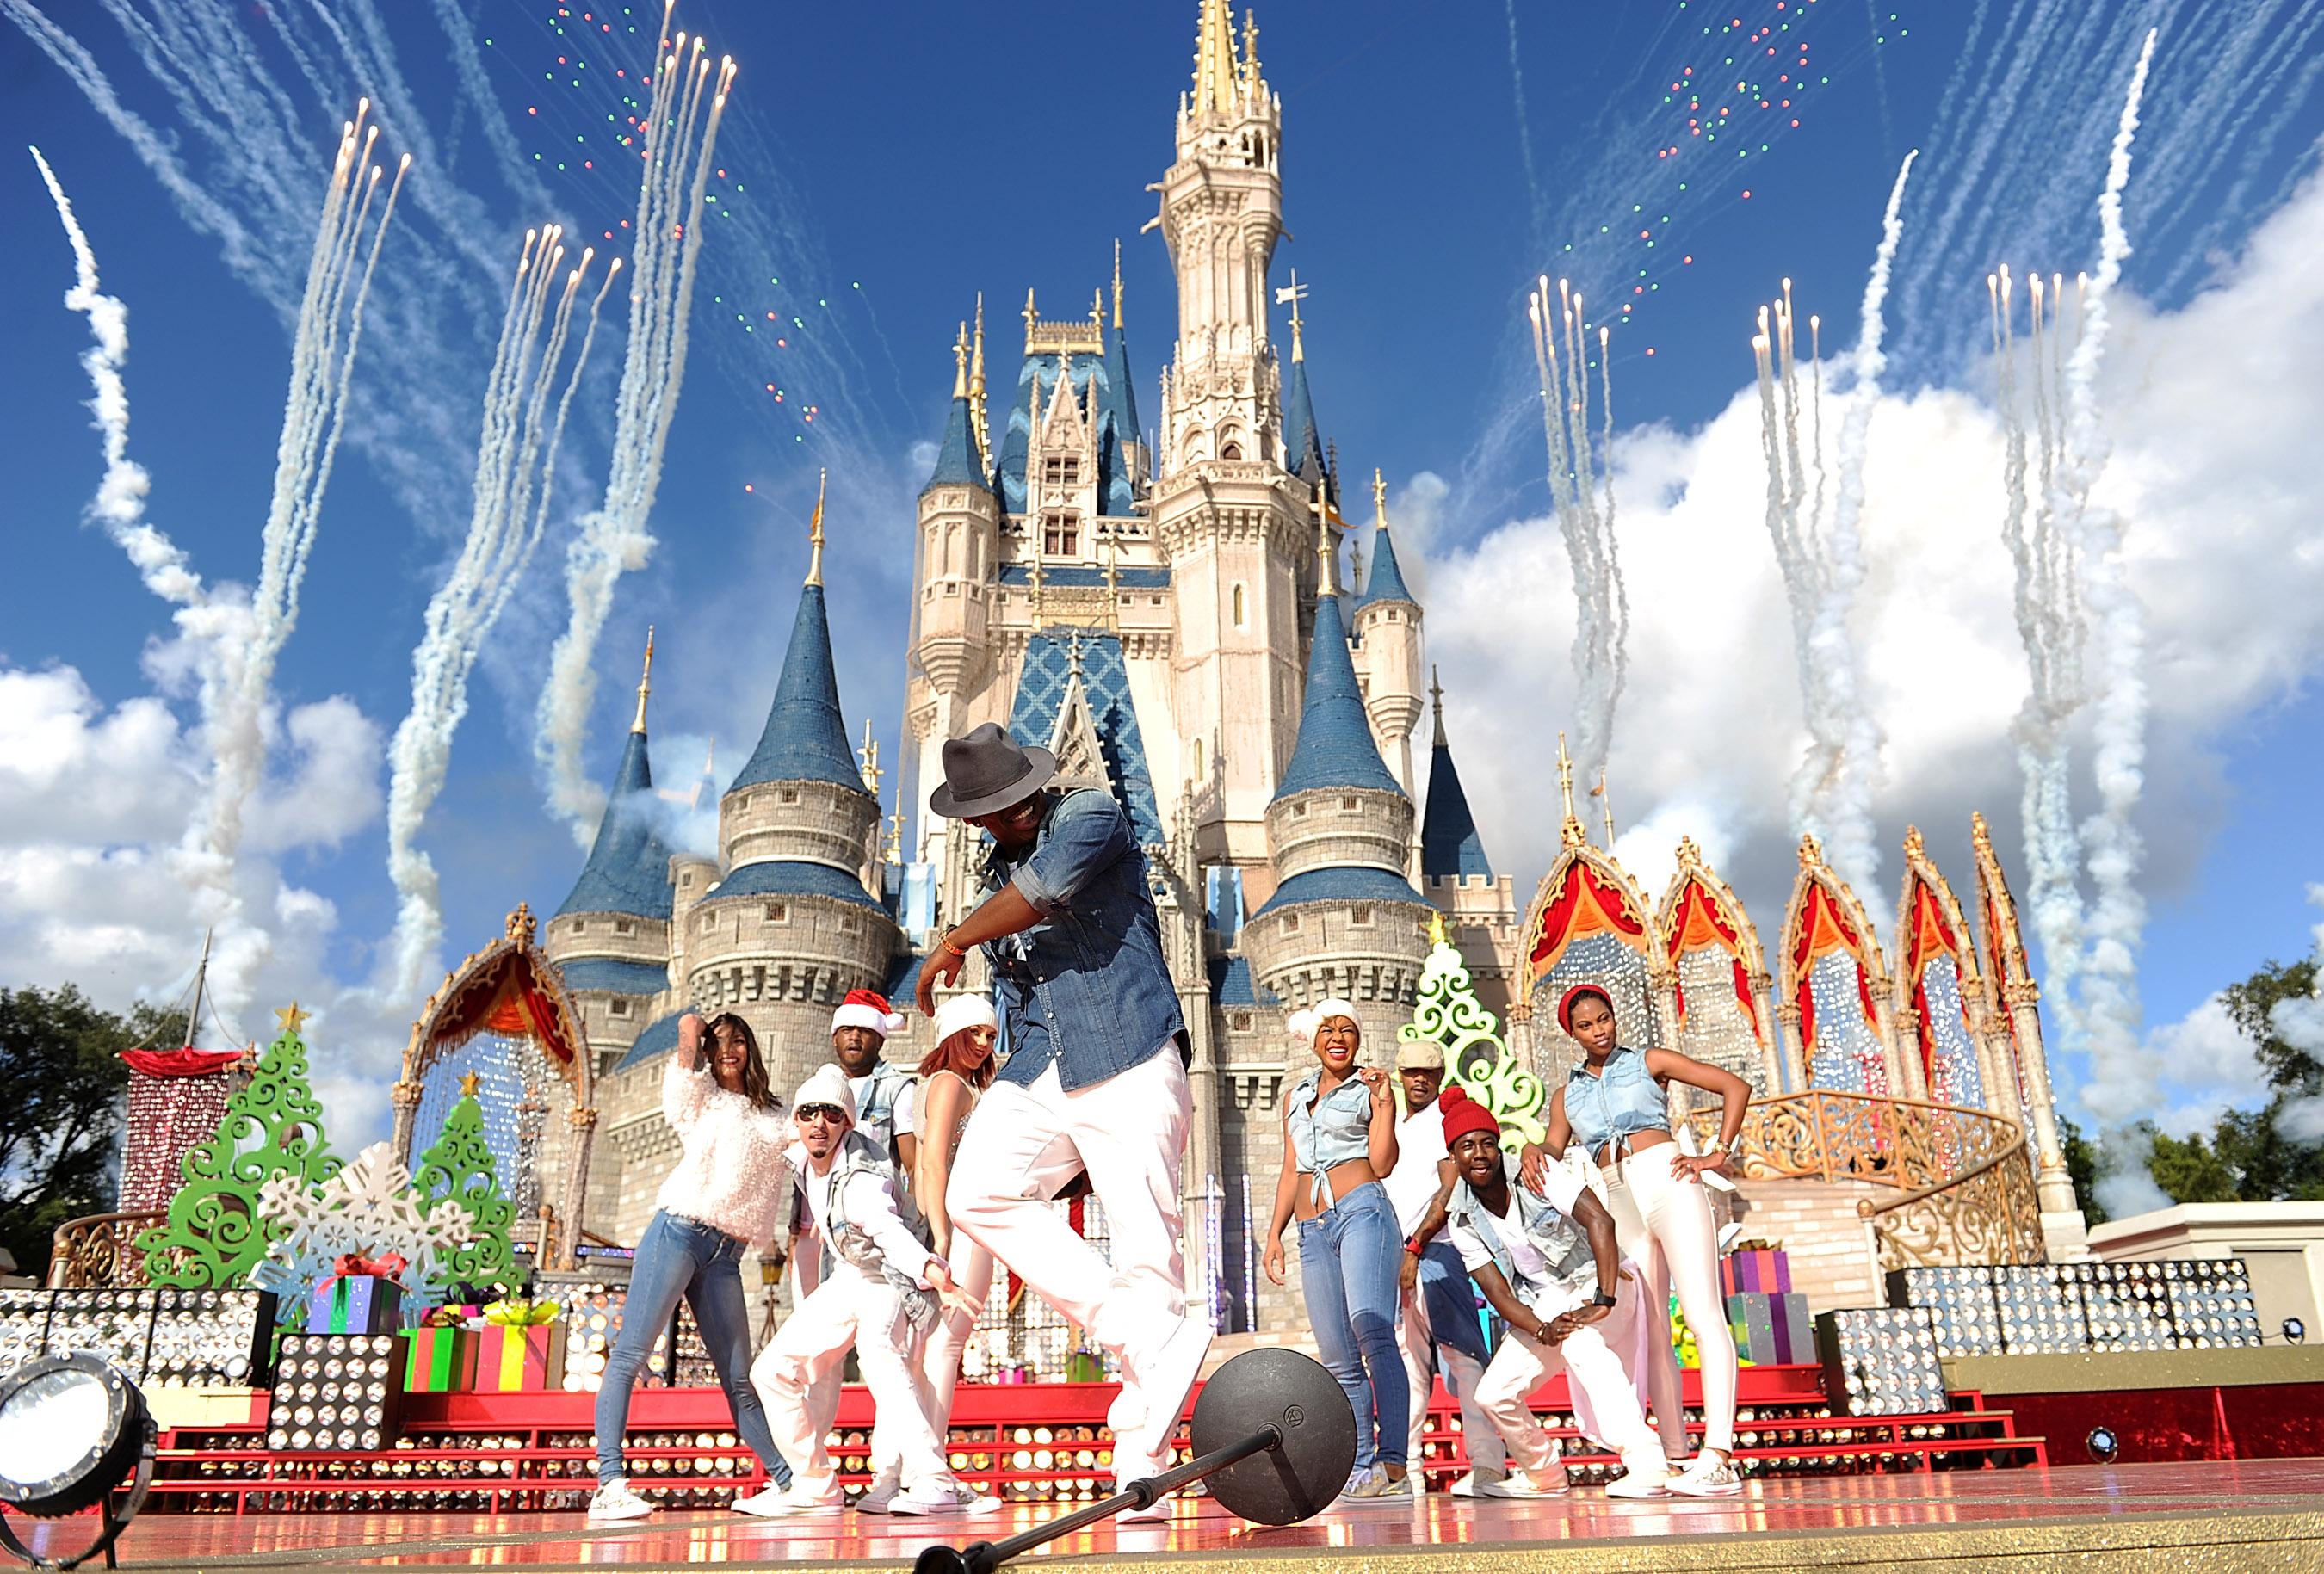 6 2013 while taping the disney parks christmas day parade tv special at the magic kingdom park at walt disney world resort in lake buena - Disney Christmas Day Parade